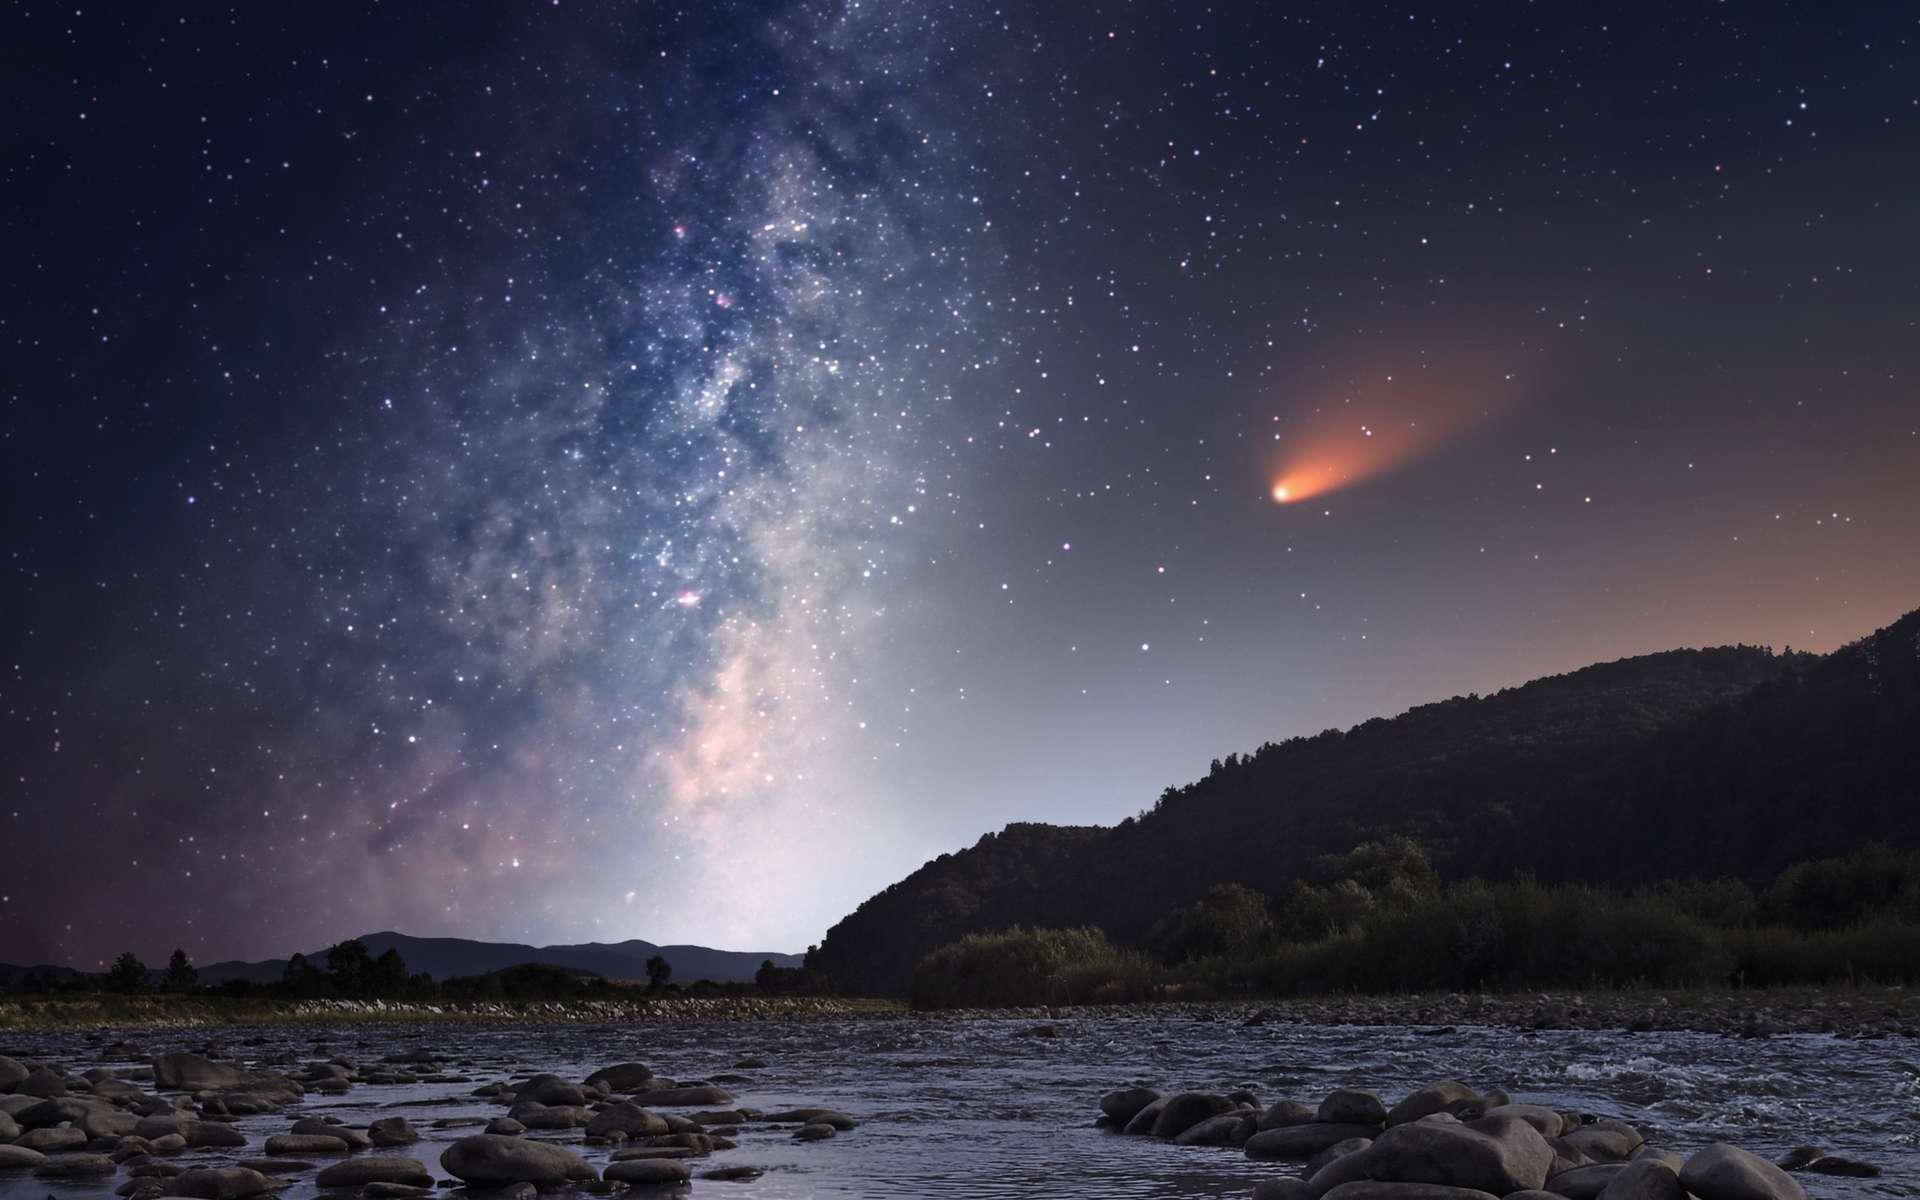 Illustration d'une comète. © Yuriy Mazur, Adobe Stock